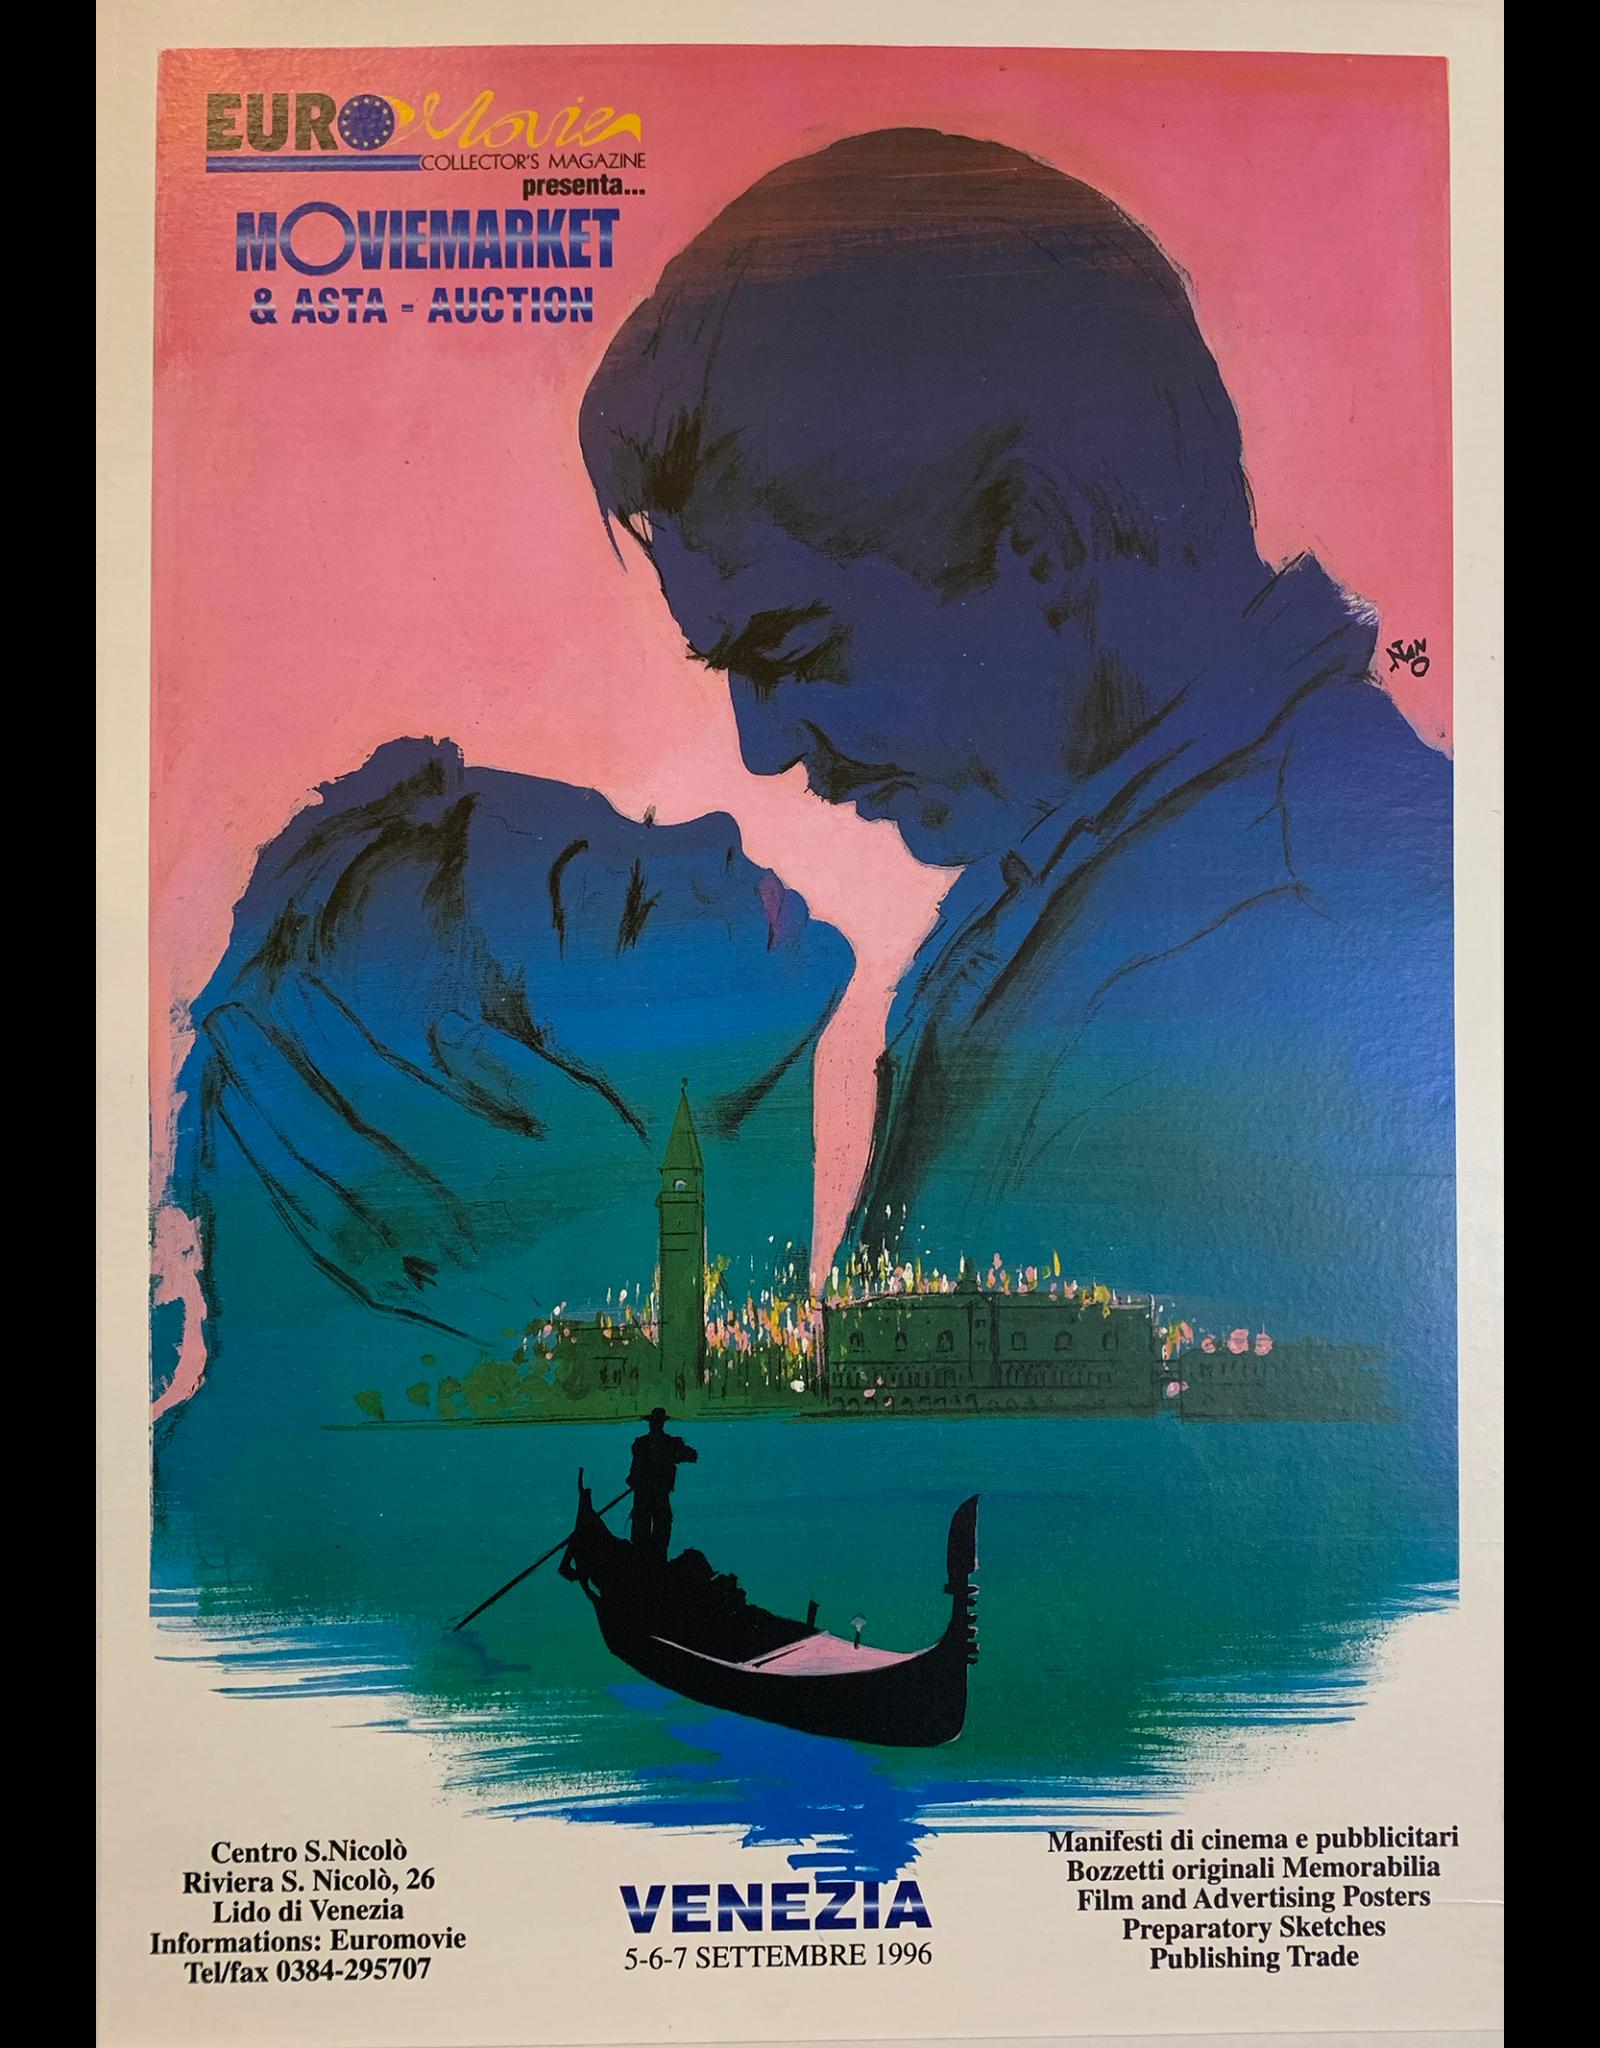 SPV MovieMarket Auction Poster